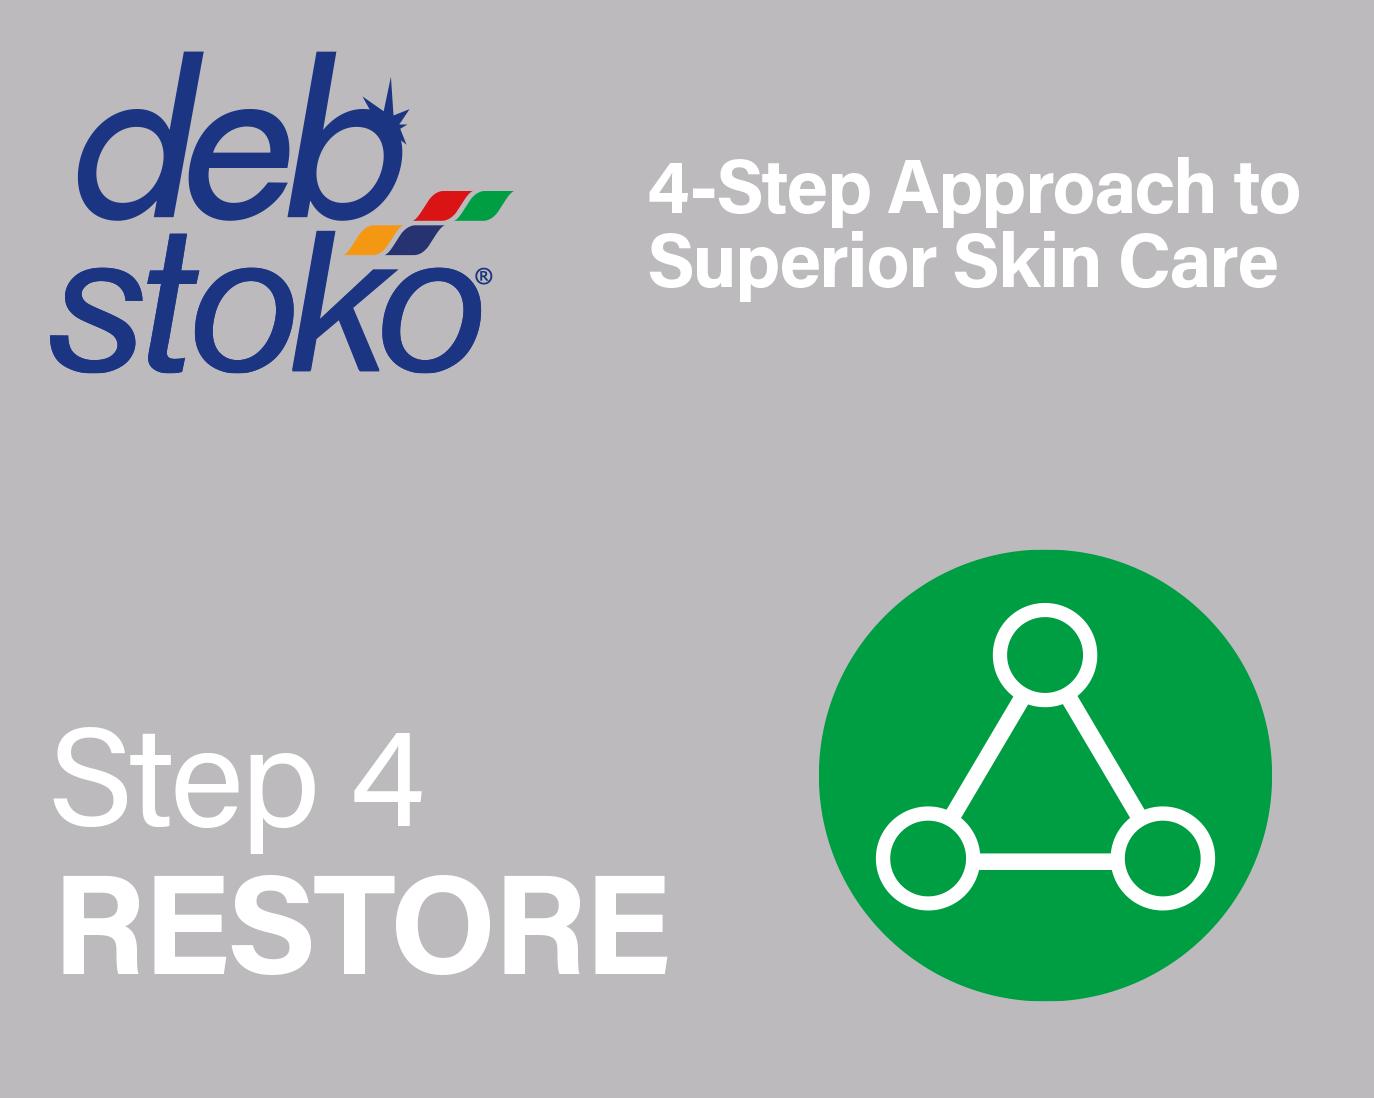 Step 4: Restore